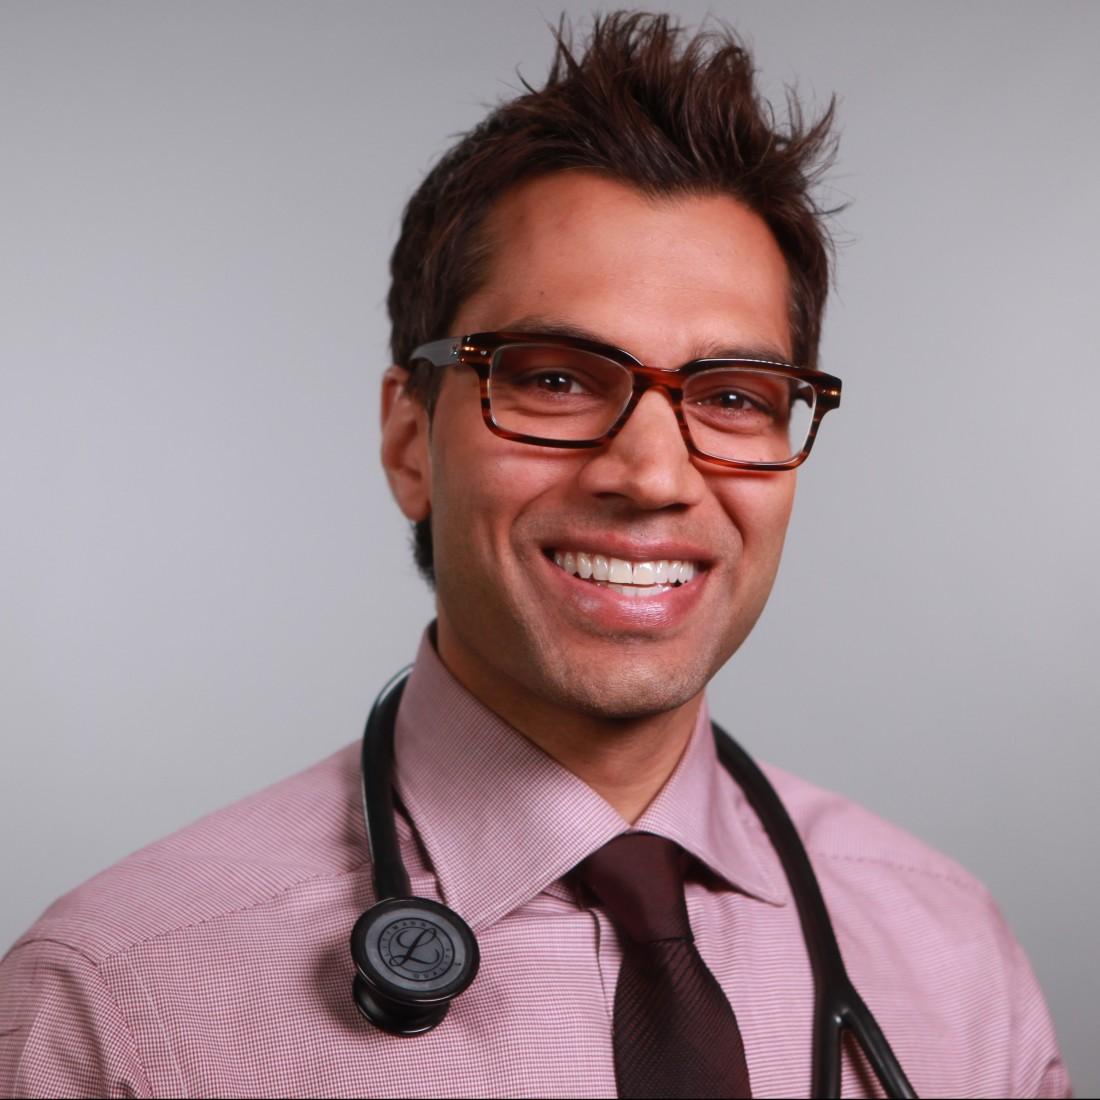 Dr. Samir Gupta